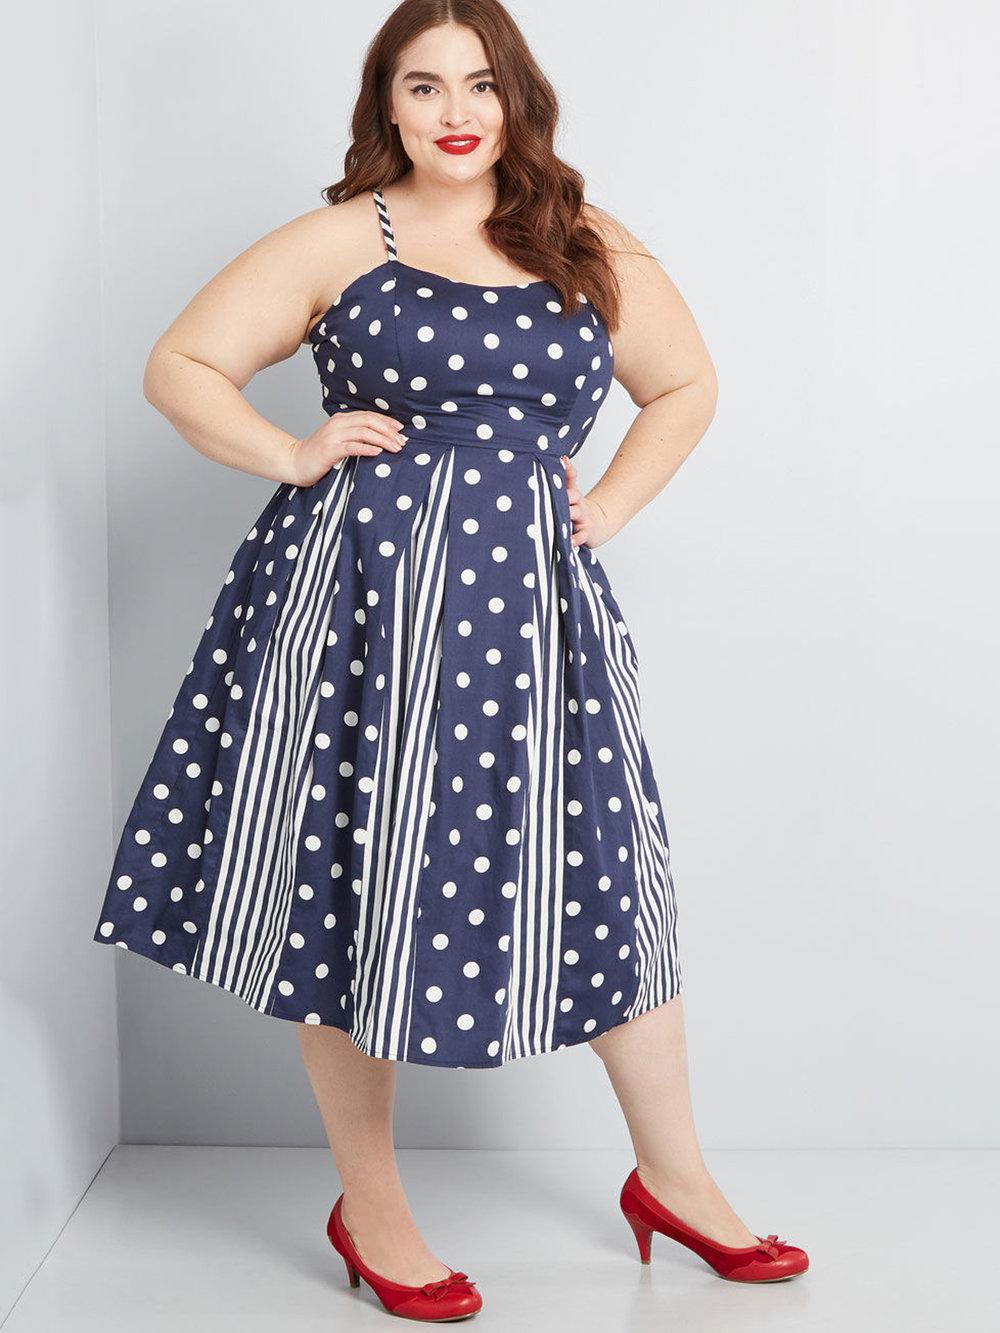 curvy-con-dress-14.jpg